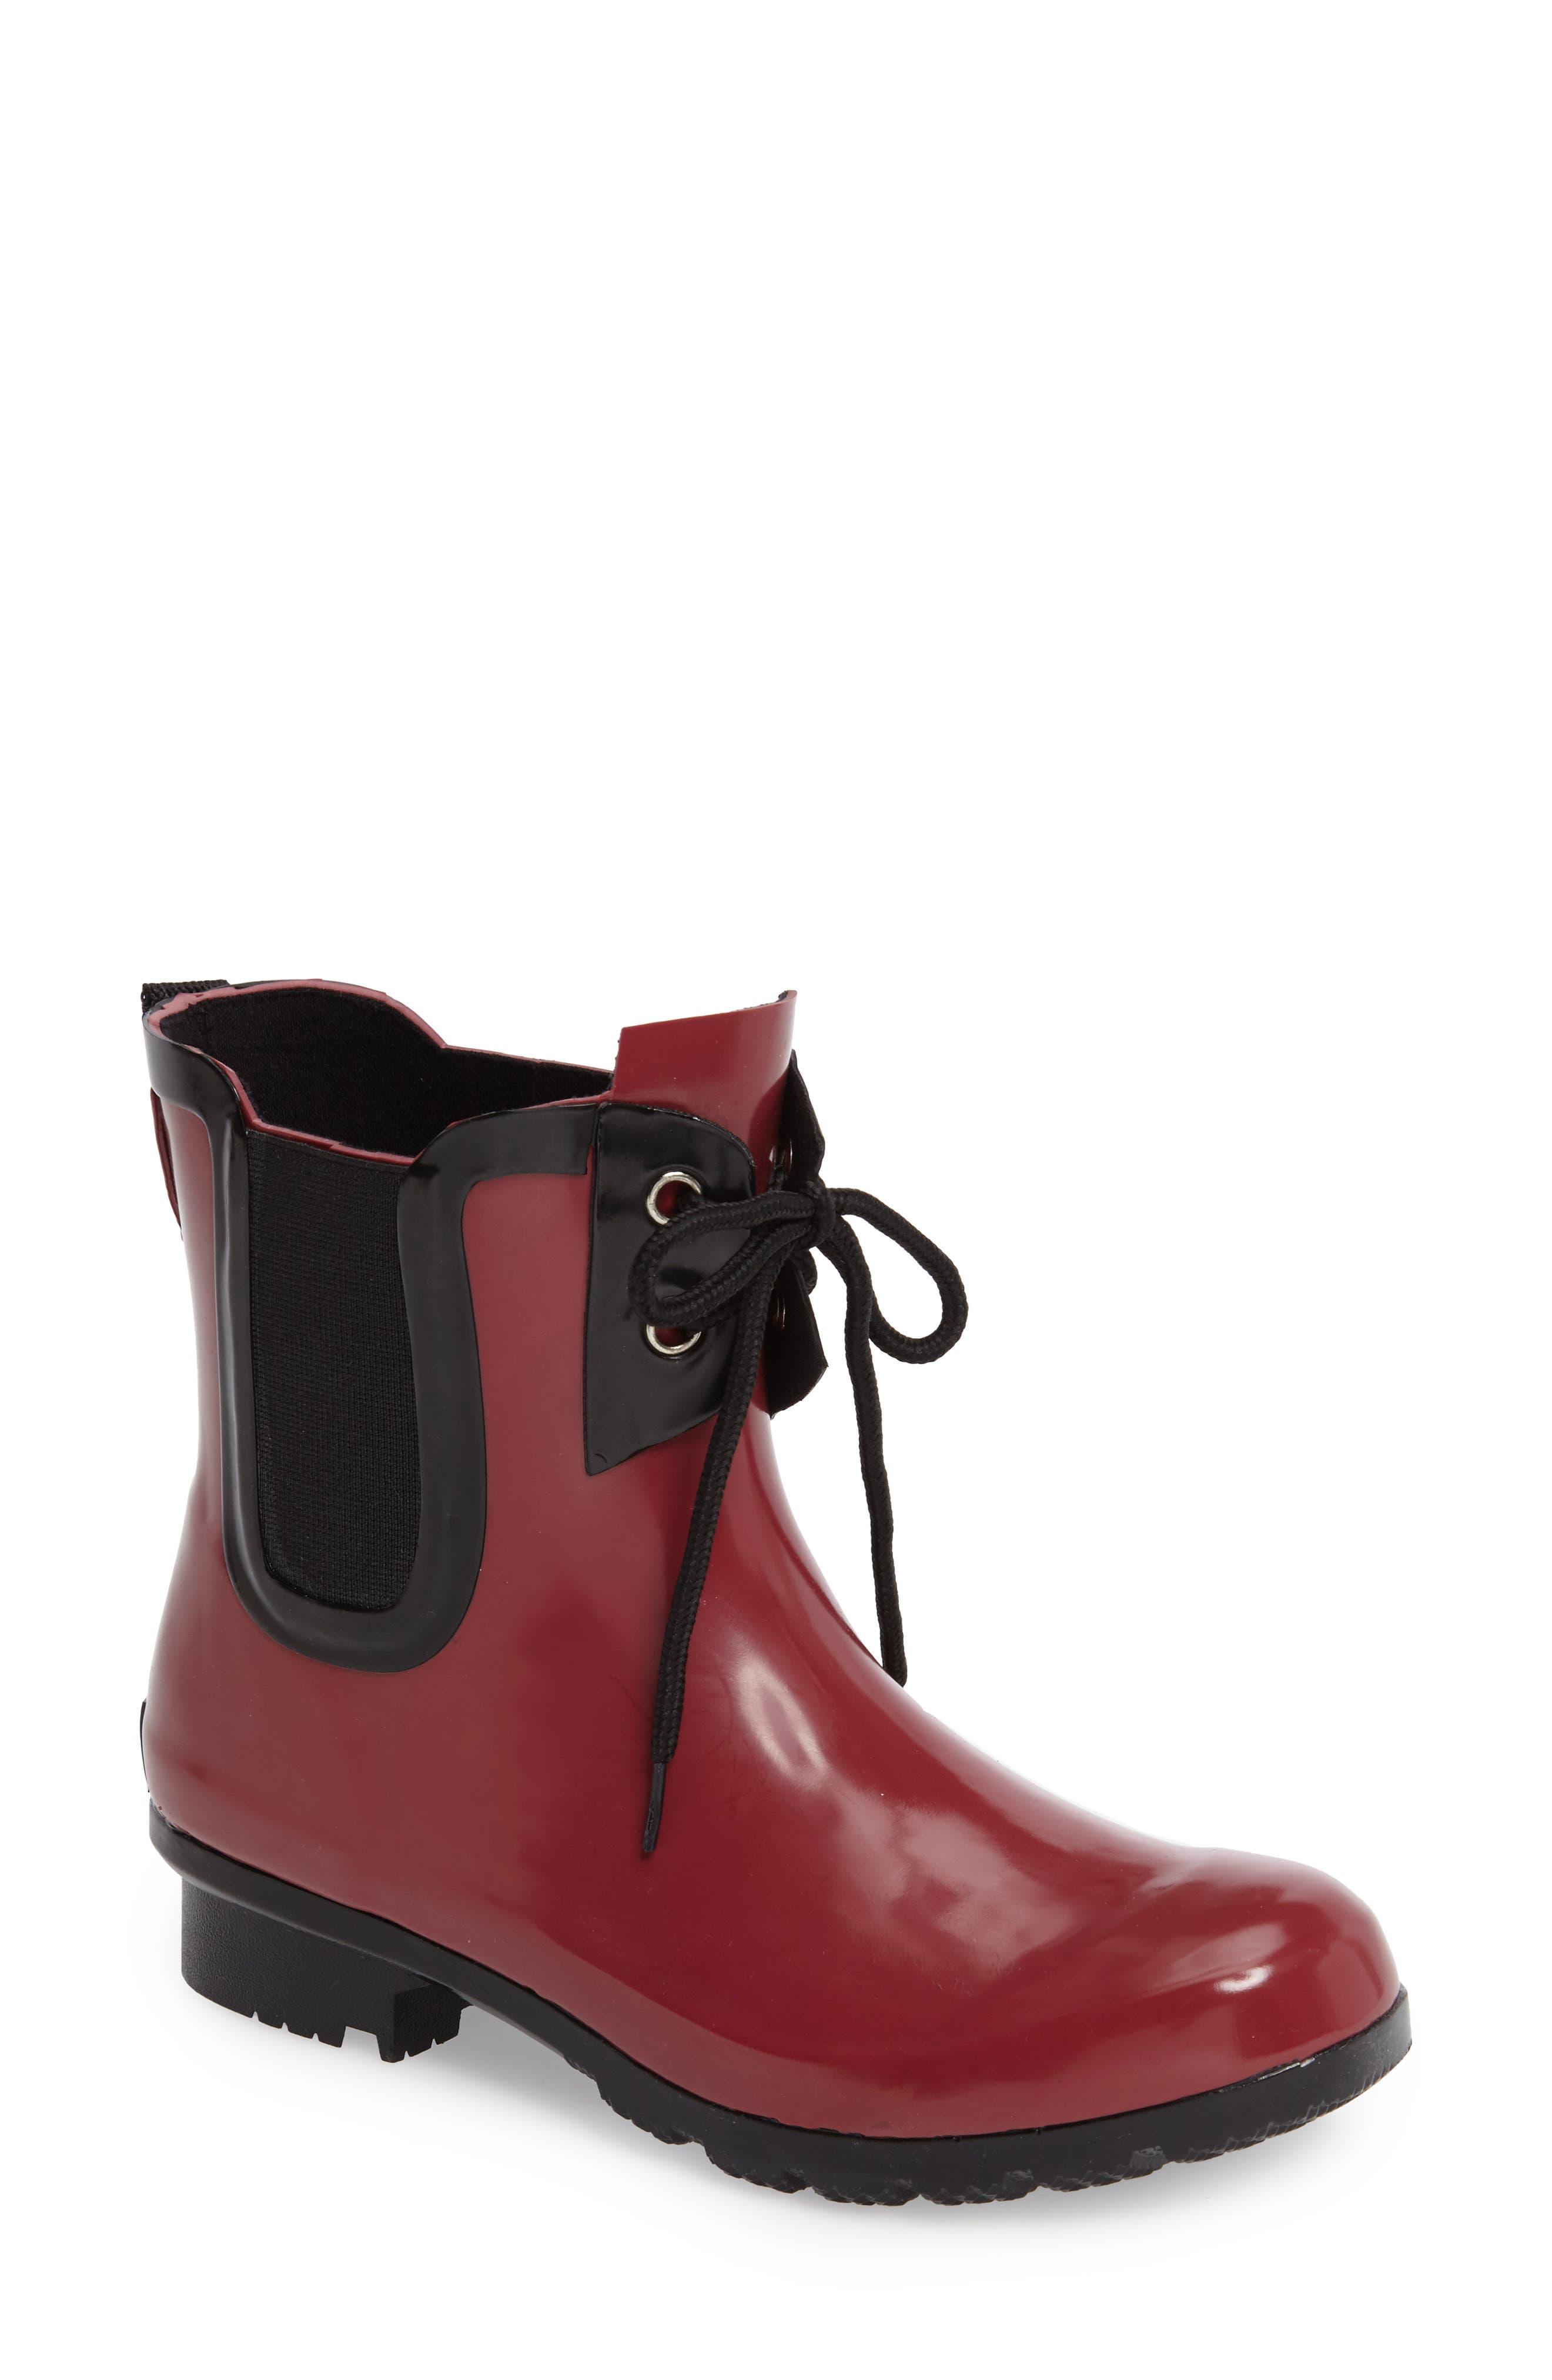 Main Image - roma Waterproof Chelsea Rain Boot (Women)